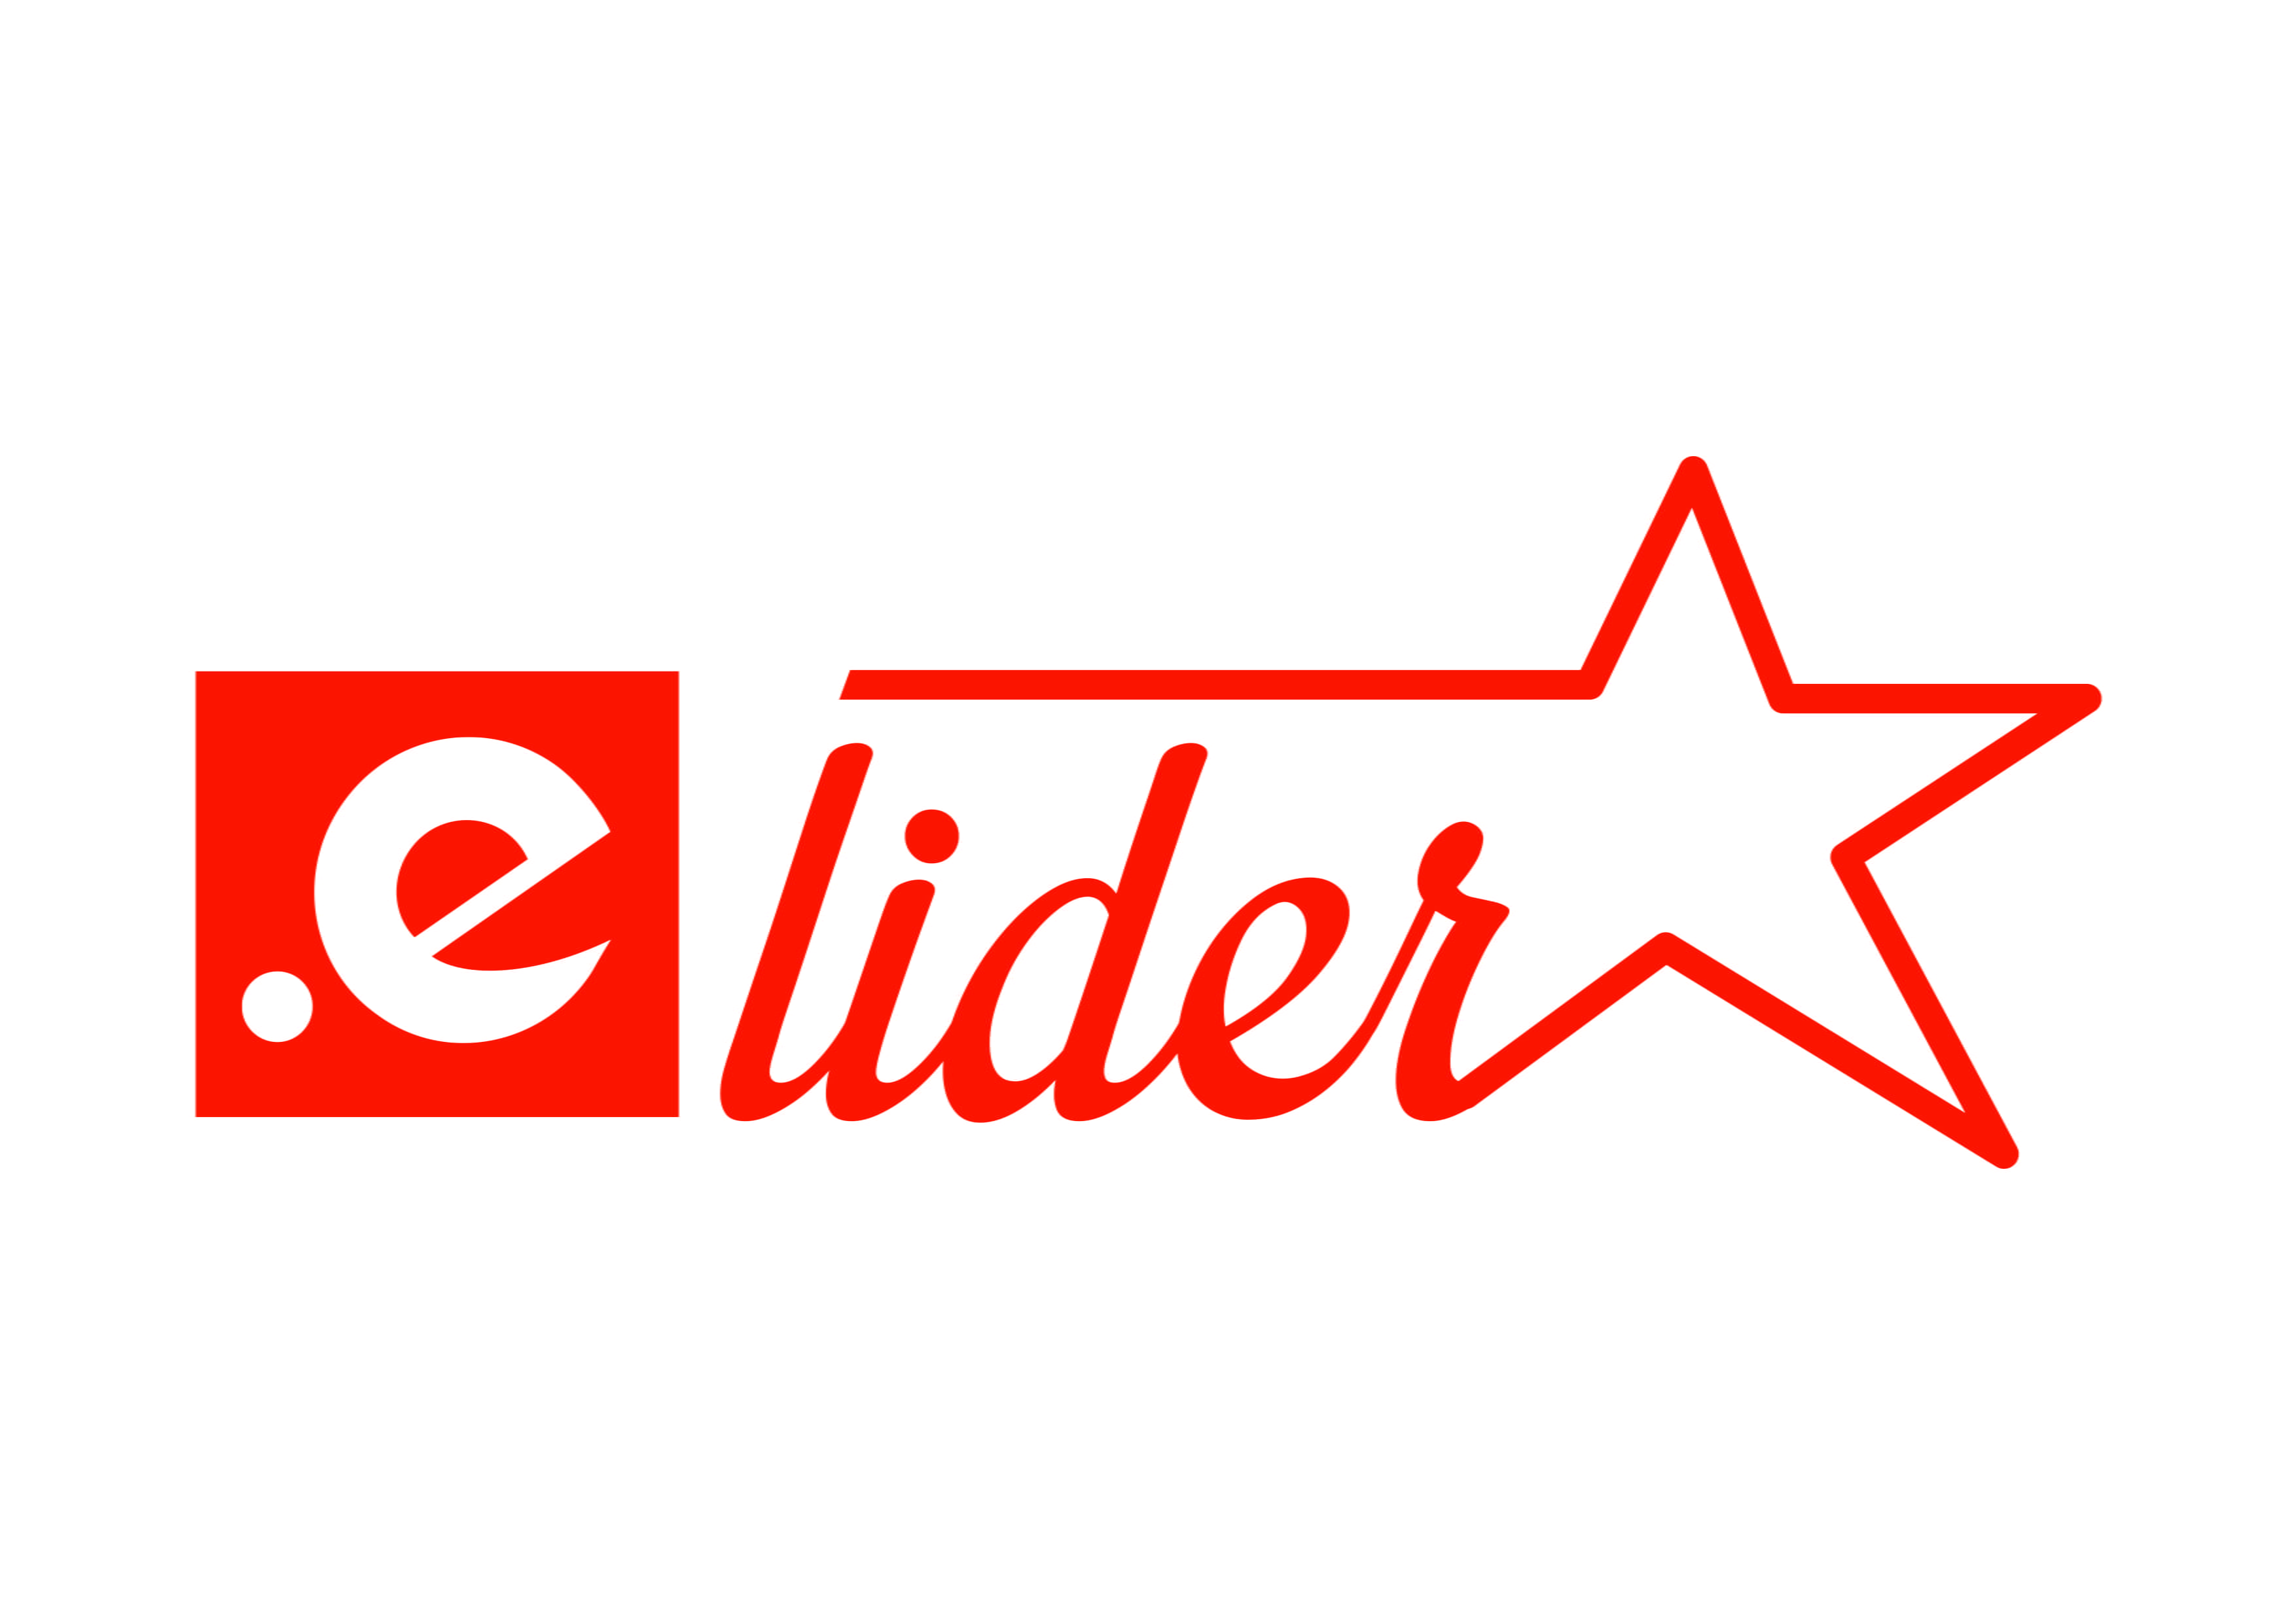 Logotyp elider